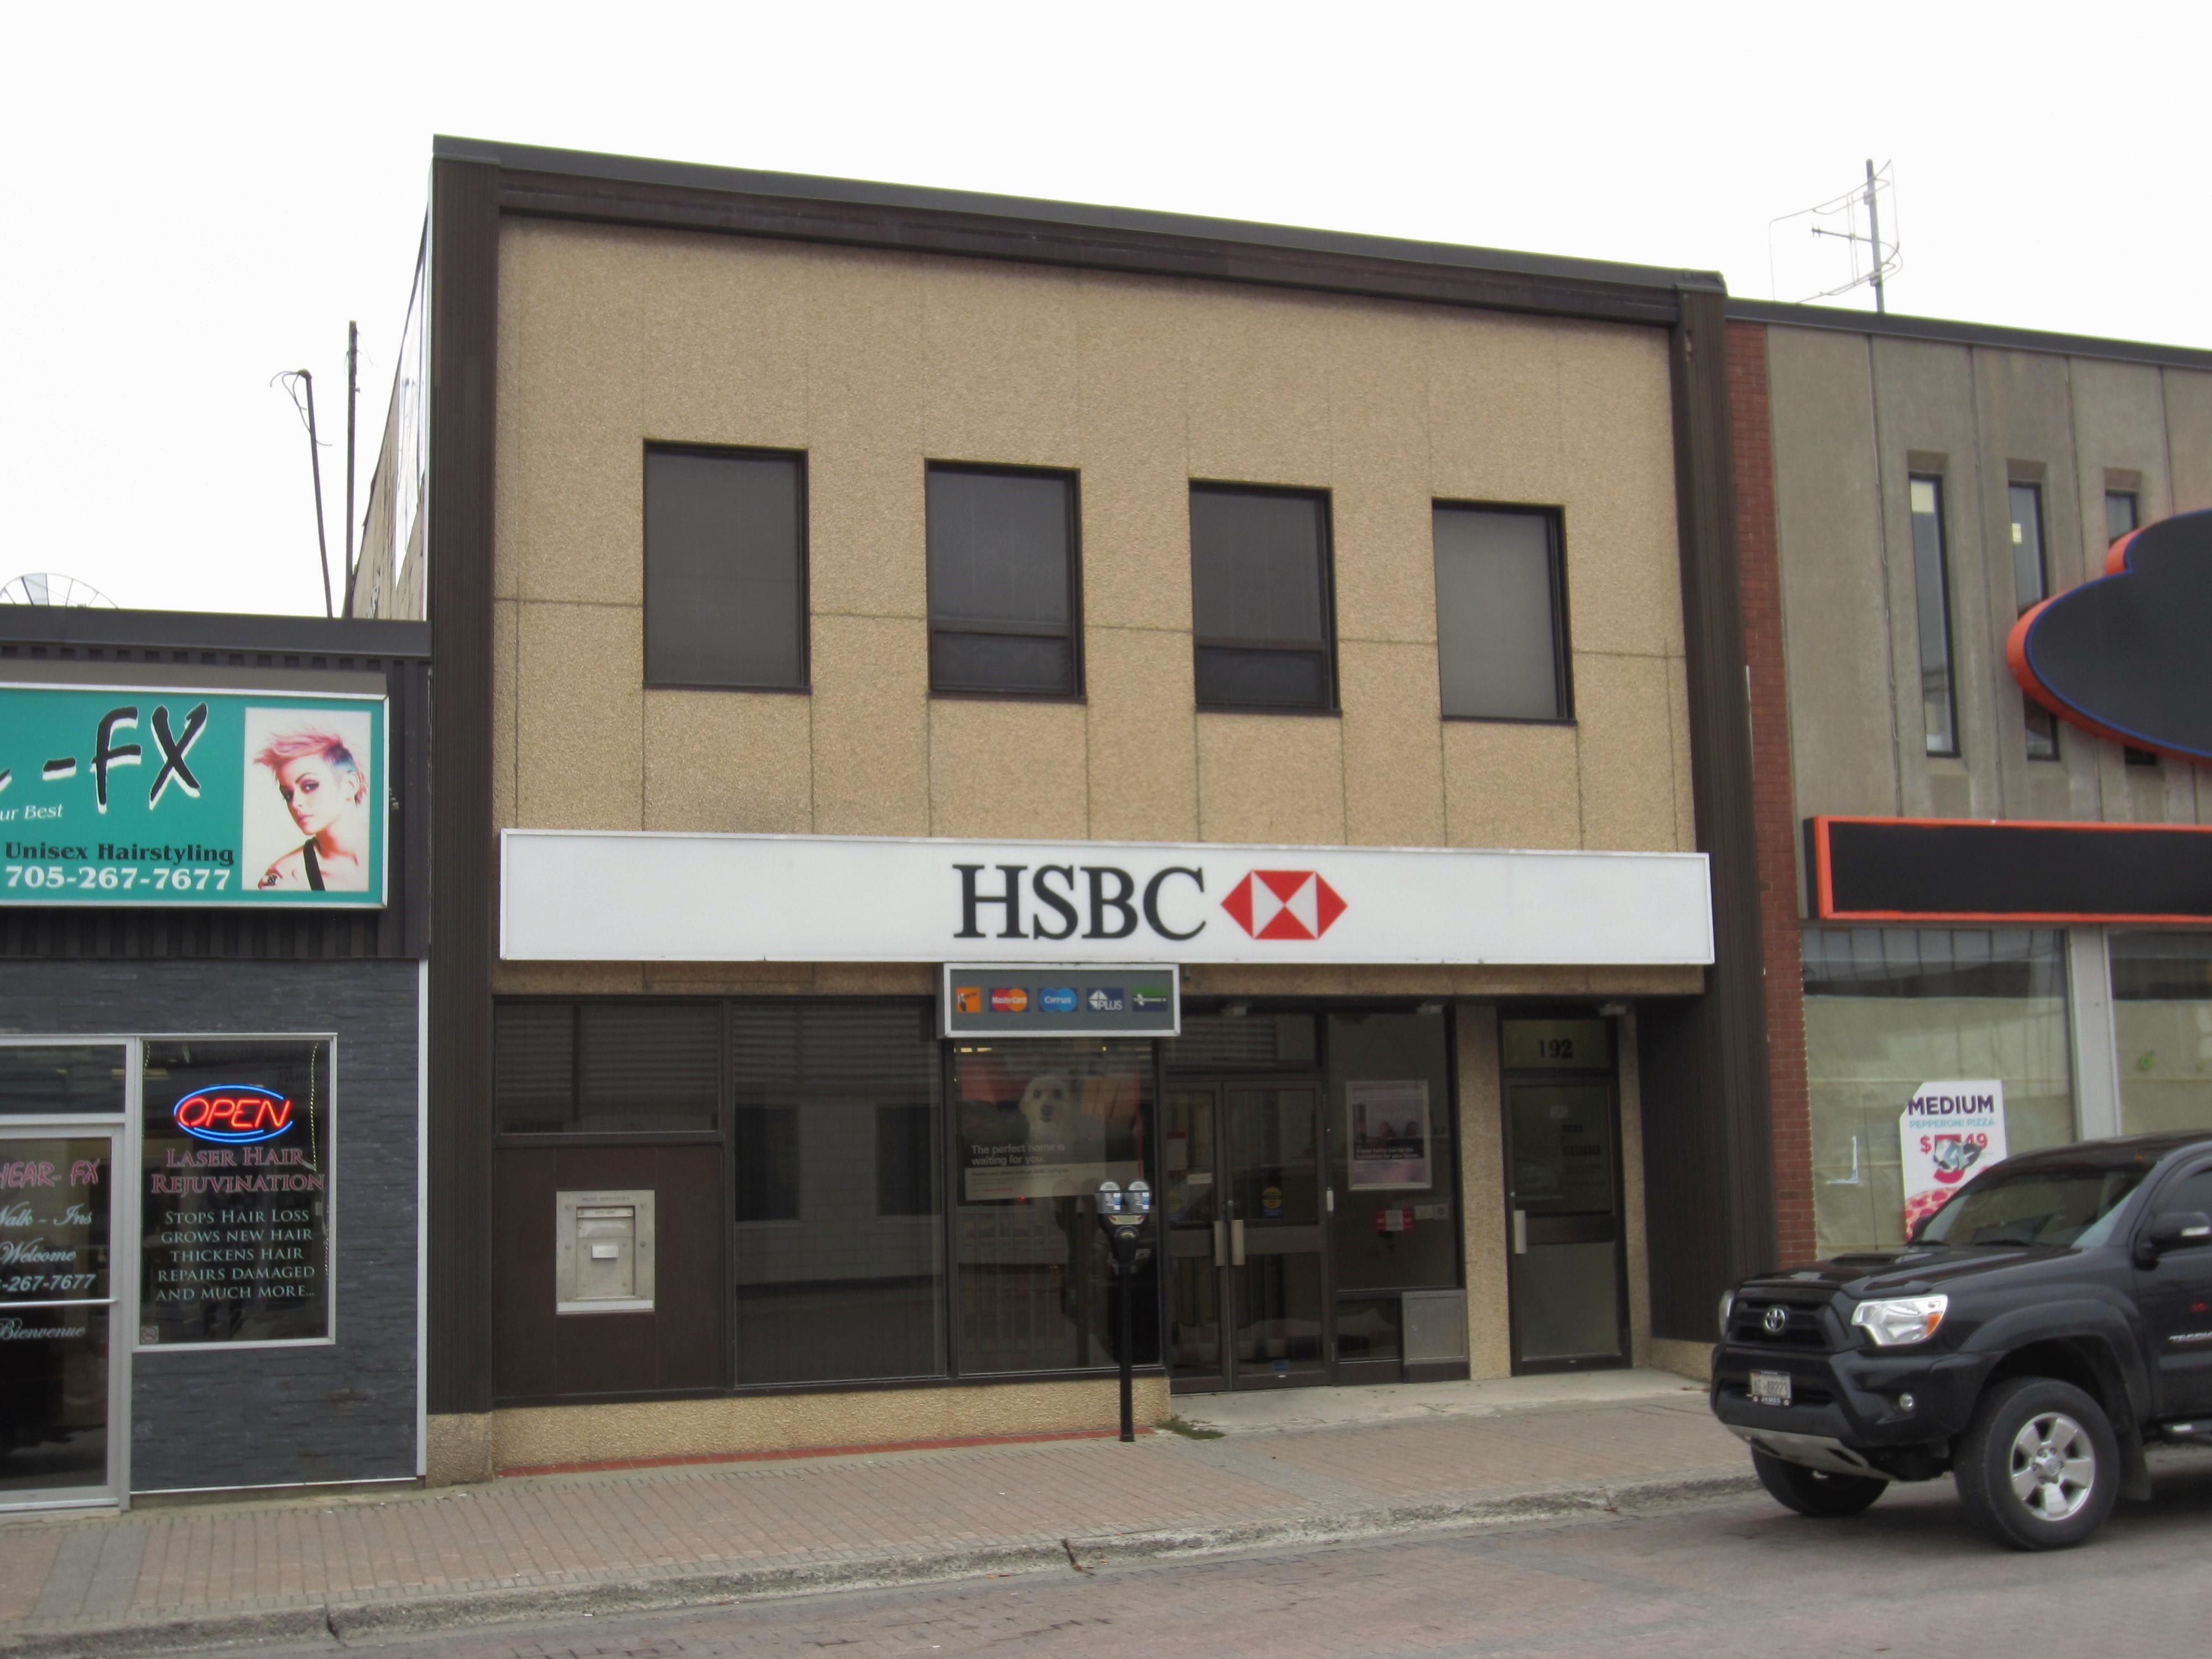 HSBC to close Timmins branch - TimminsToday com